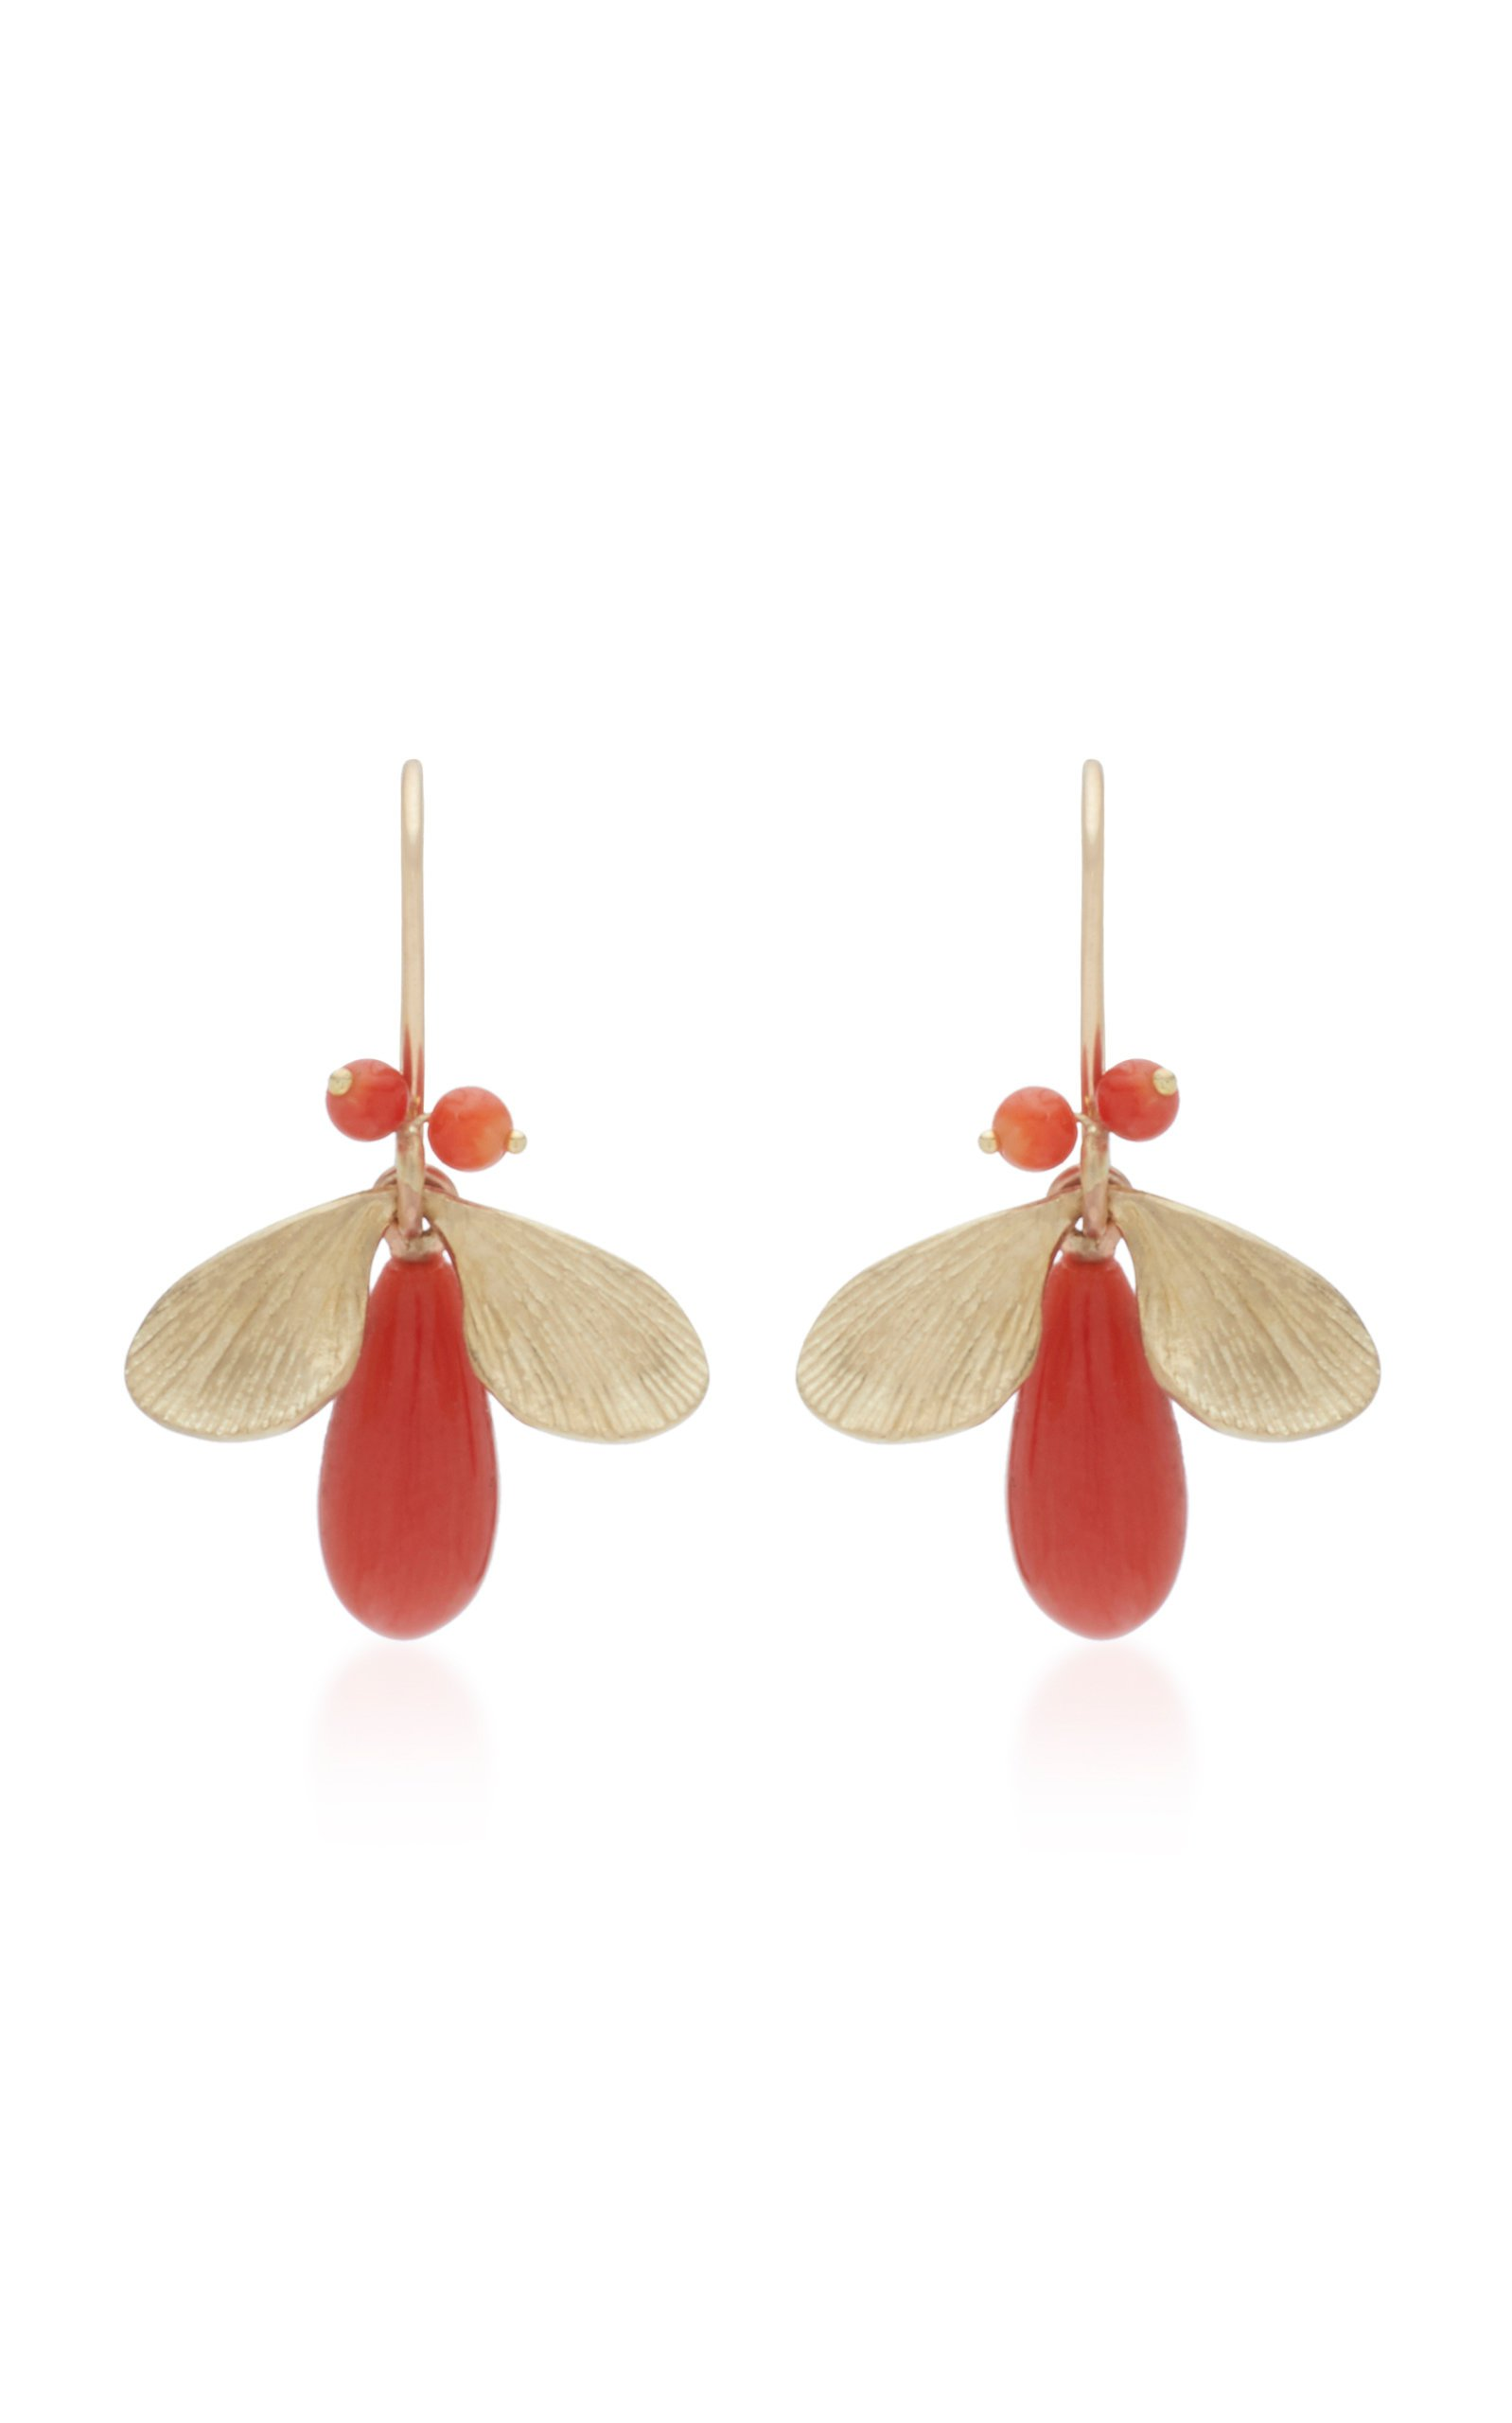 Annette Ferdinandsen Jeweled Bugs 14K Gold And Coral Drop Earrings